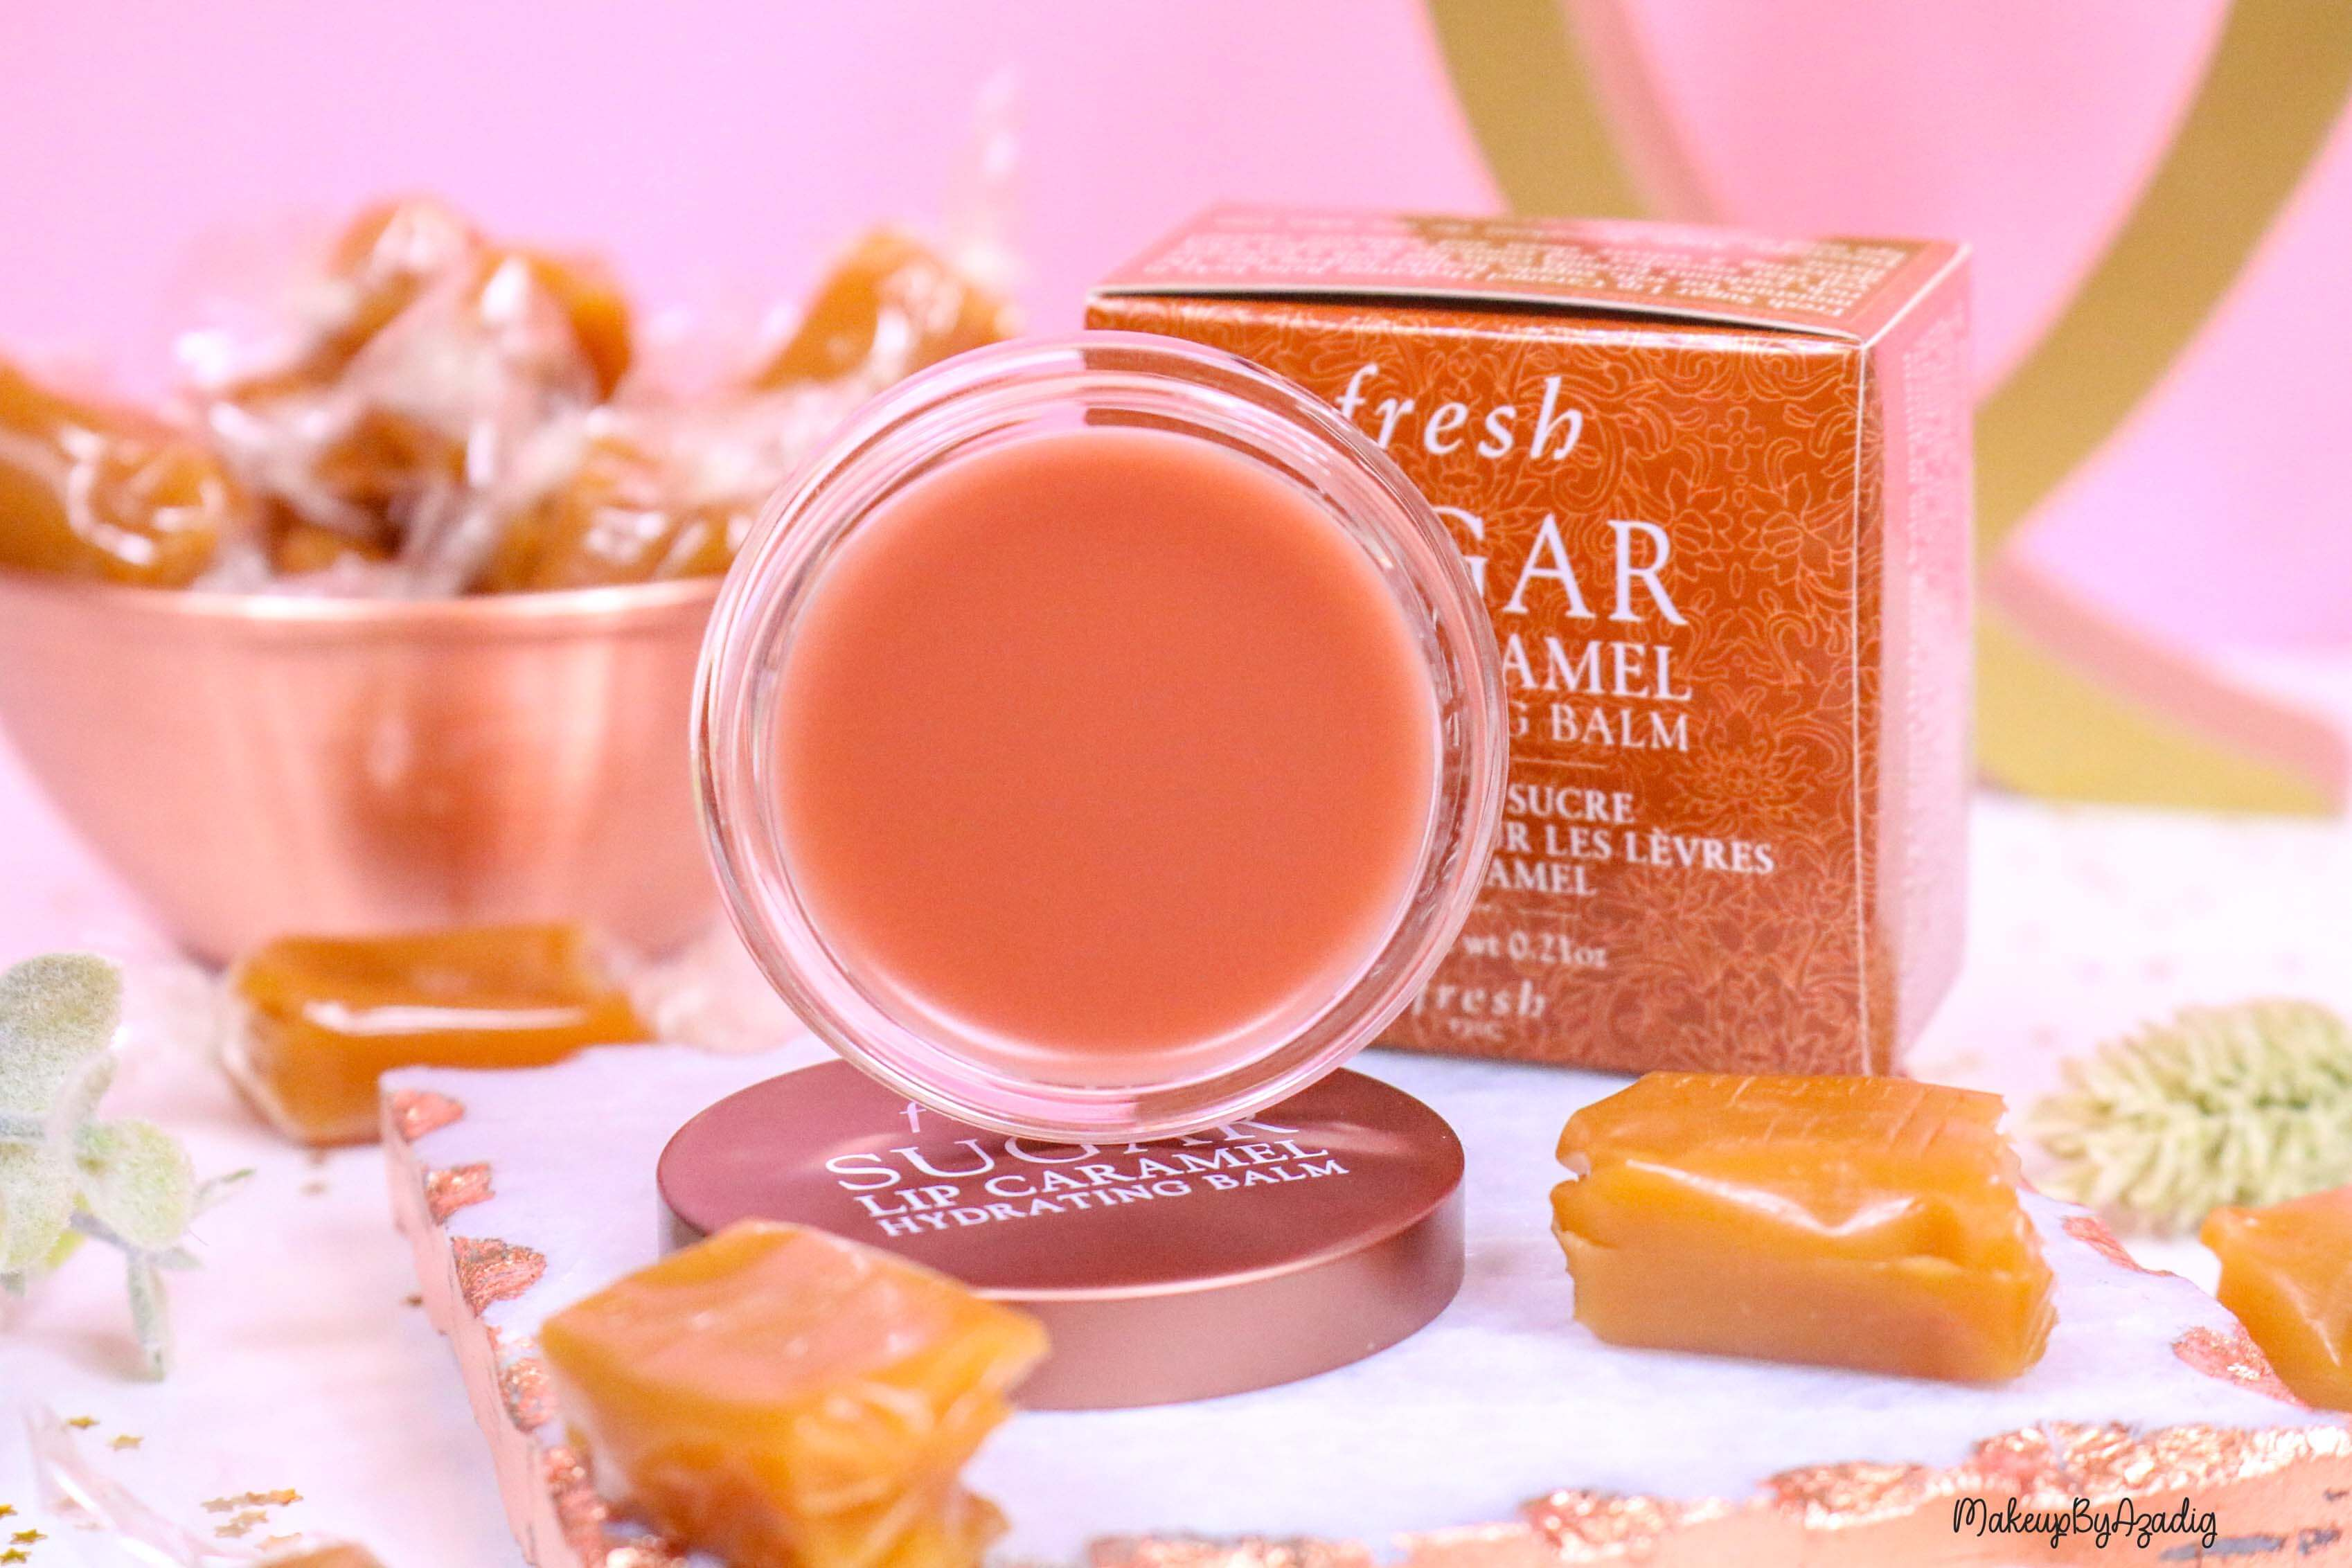 revue-baume-sucre-fresh-beauty-skincare-caramel-sugar-lip-caramel-sephora-makeupbyazadig-avis-prix-balm-texture